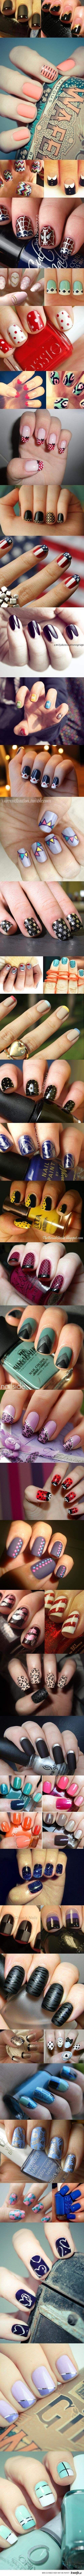 best nail art images on pinterest nail scissors make up looks